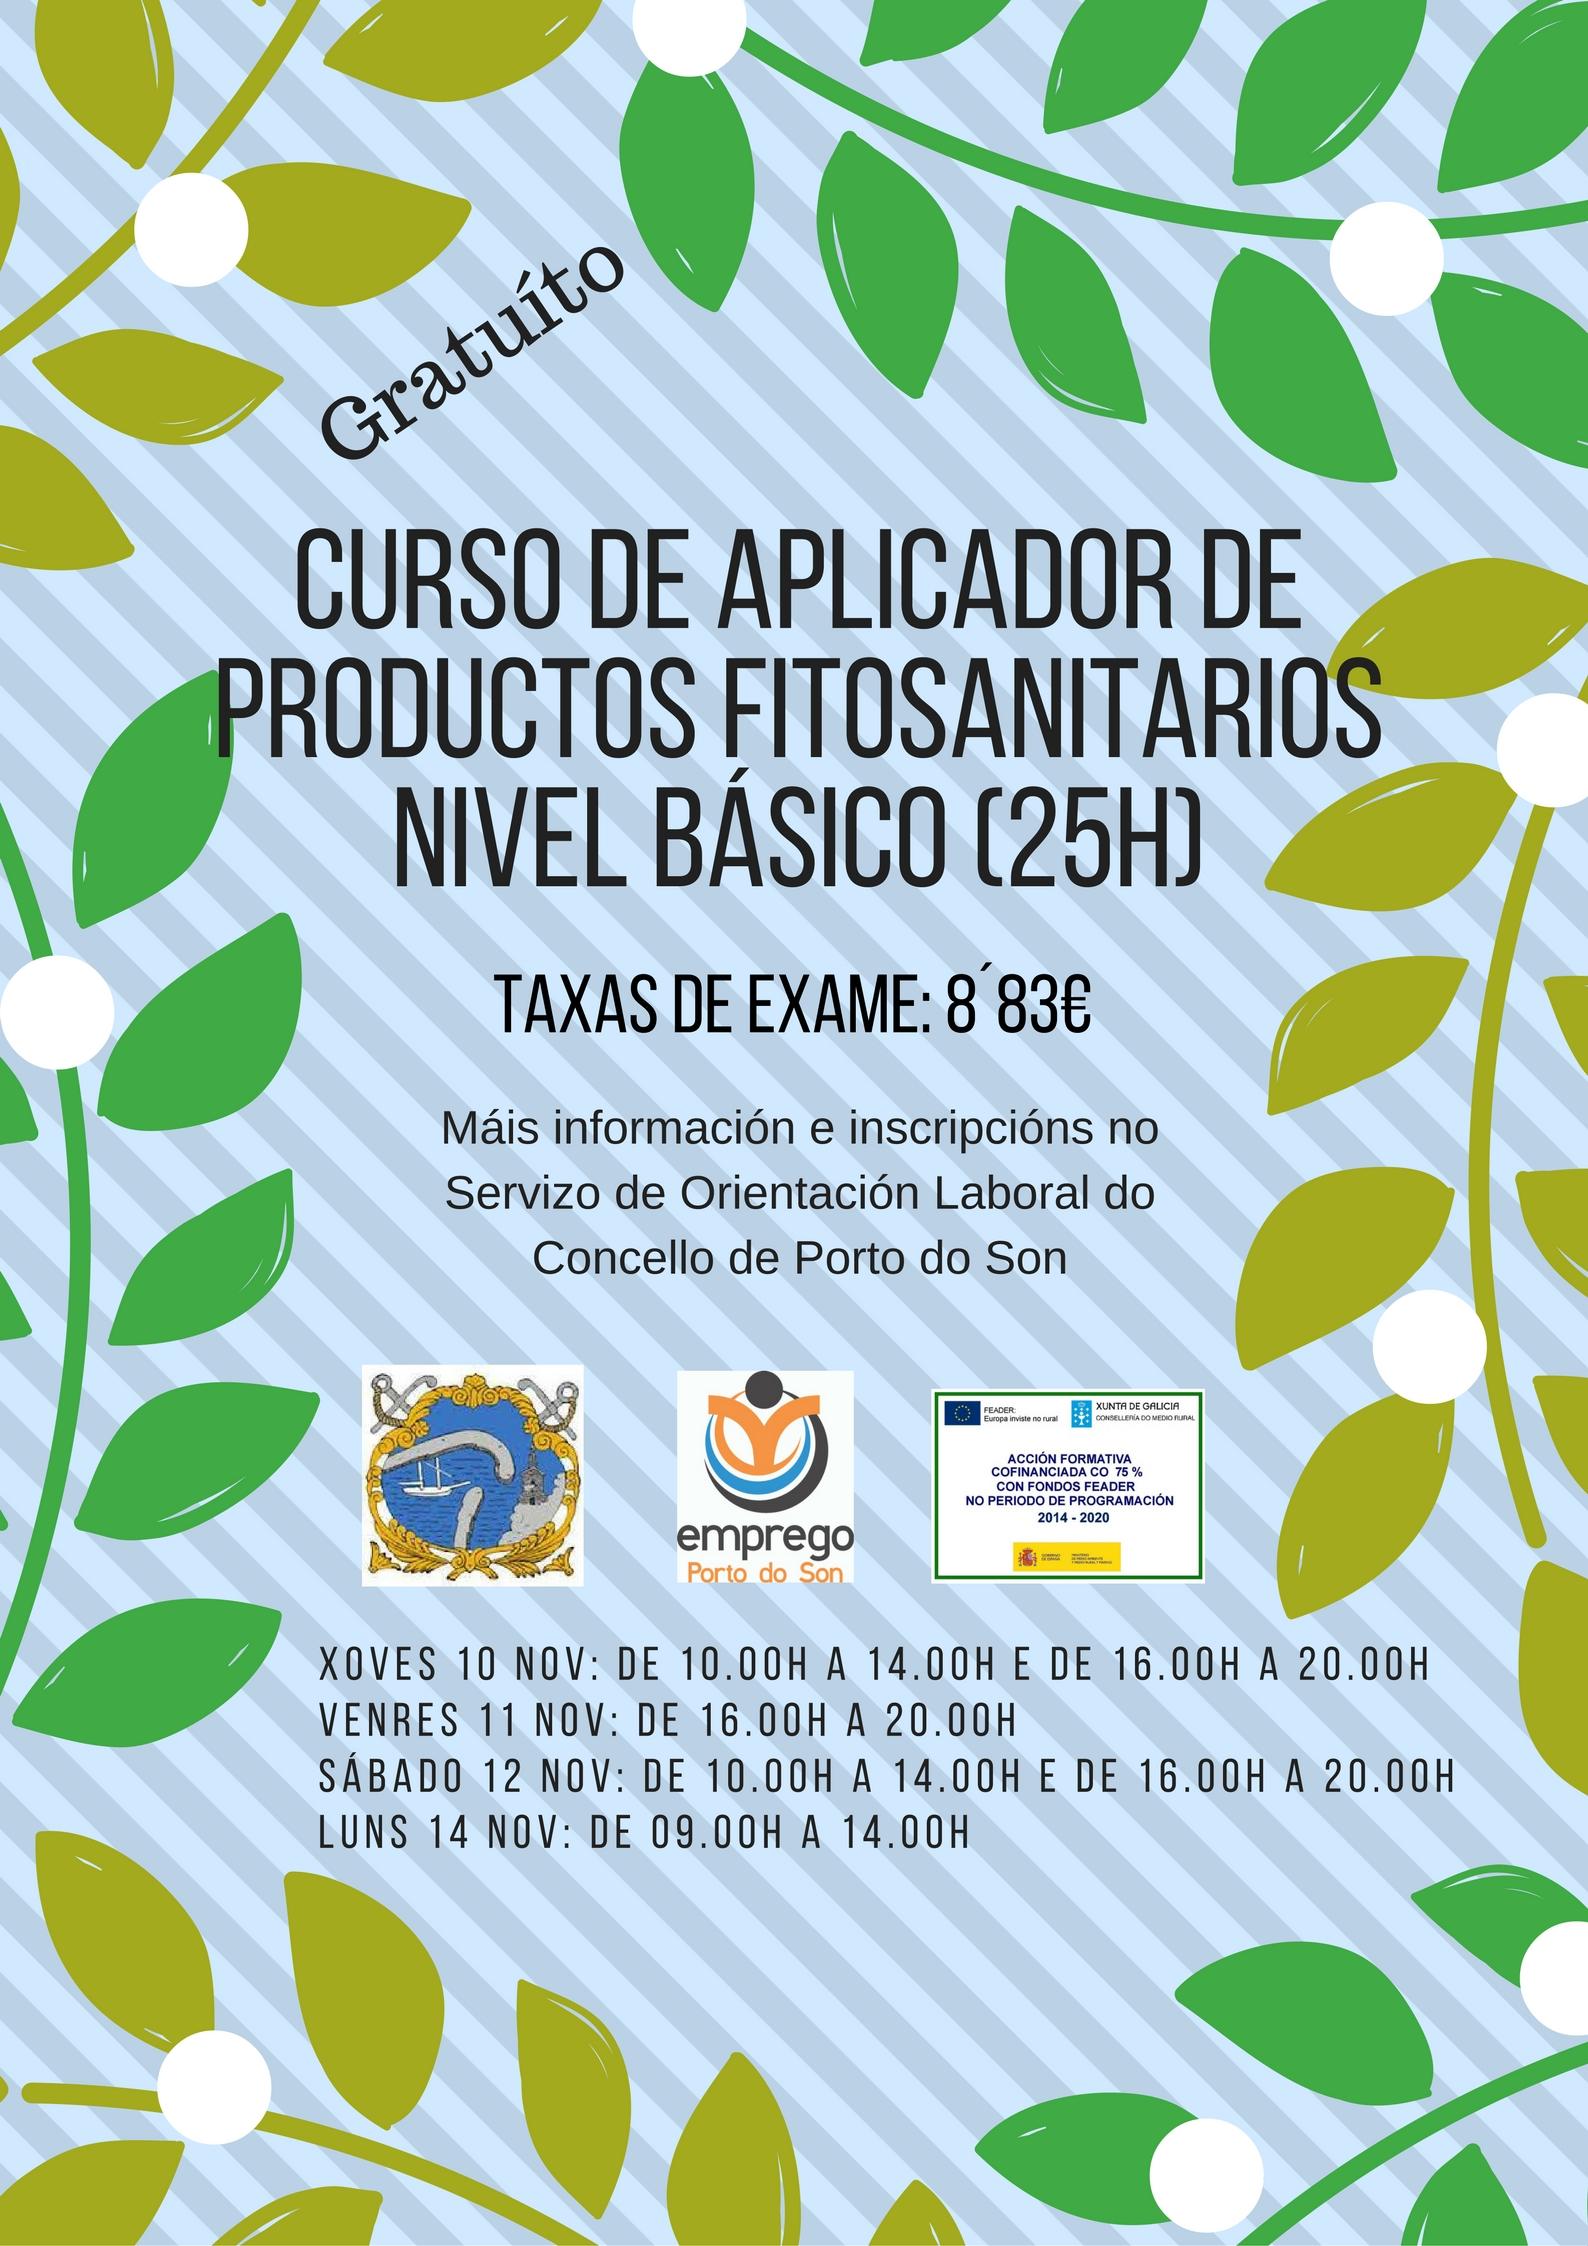 curso-de-aplicador-de-productos-fitosanitarios